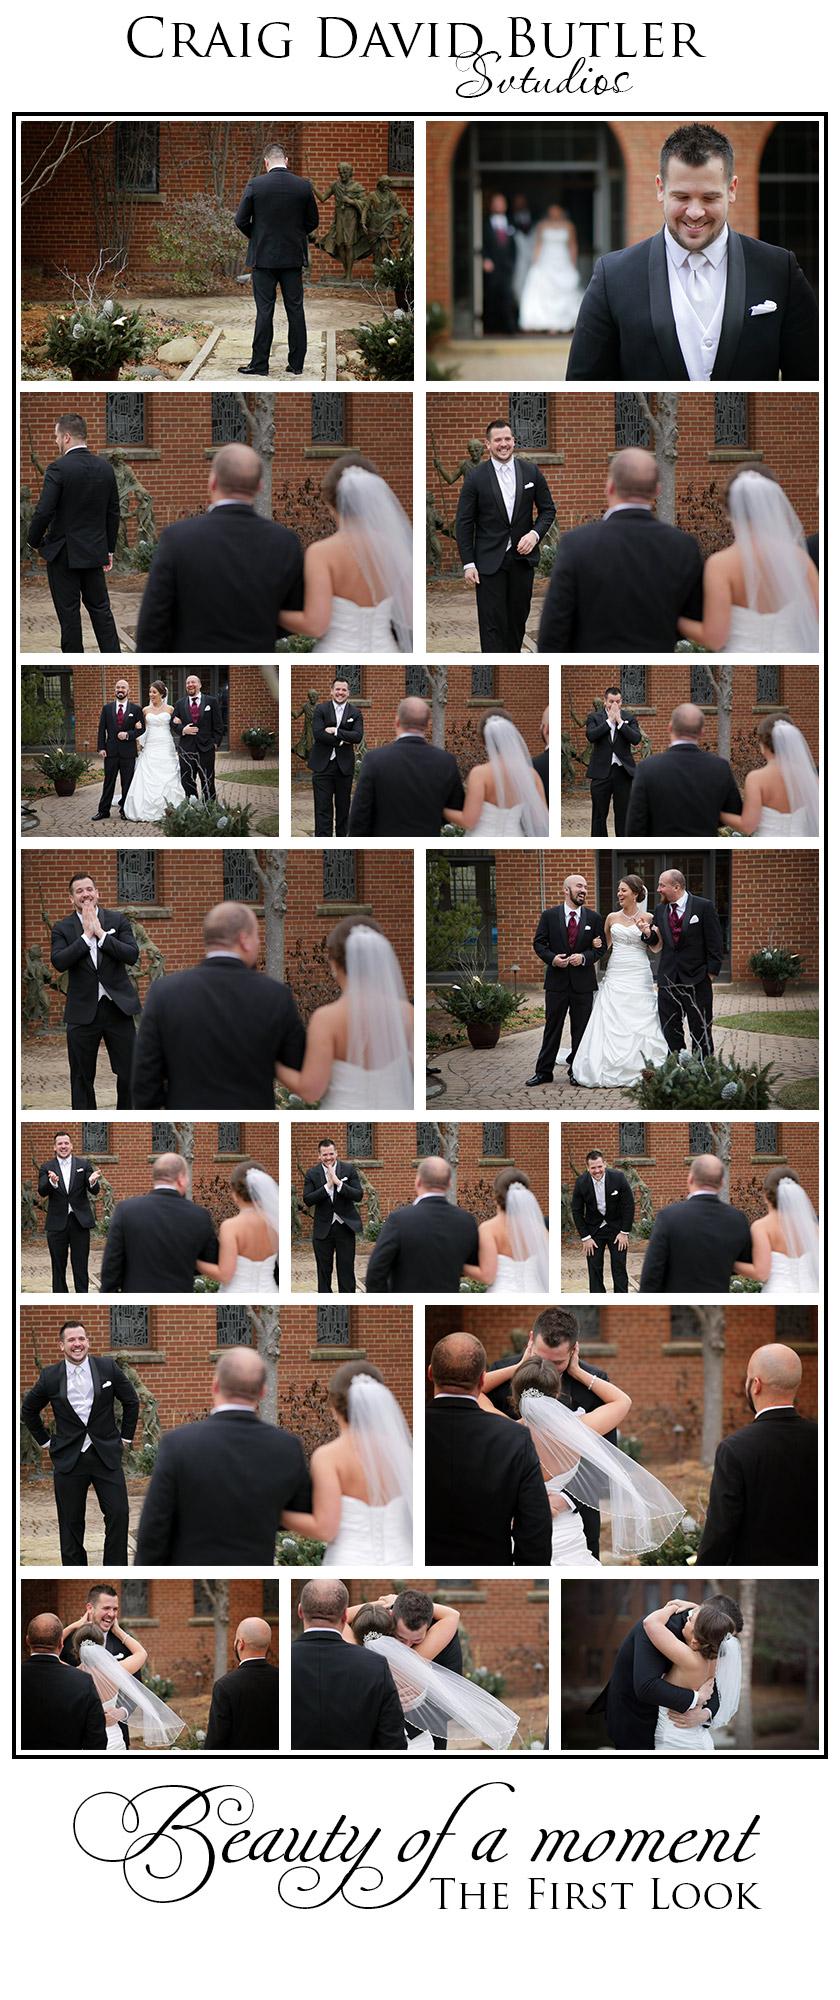 Wedding First Look - Craig David Butler Studios